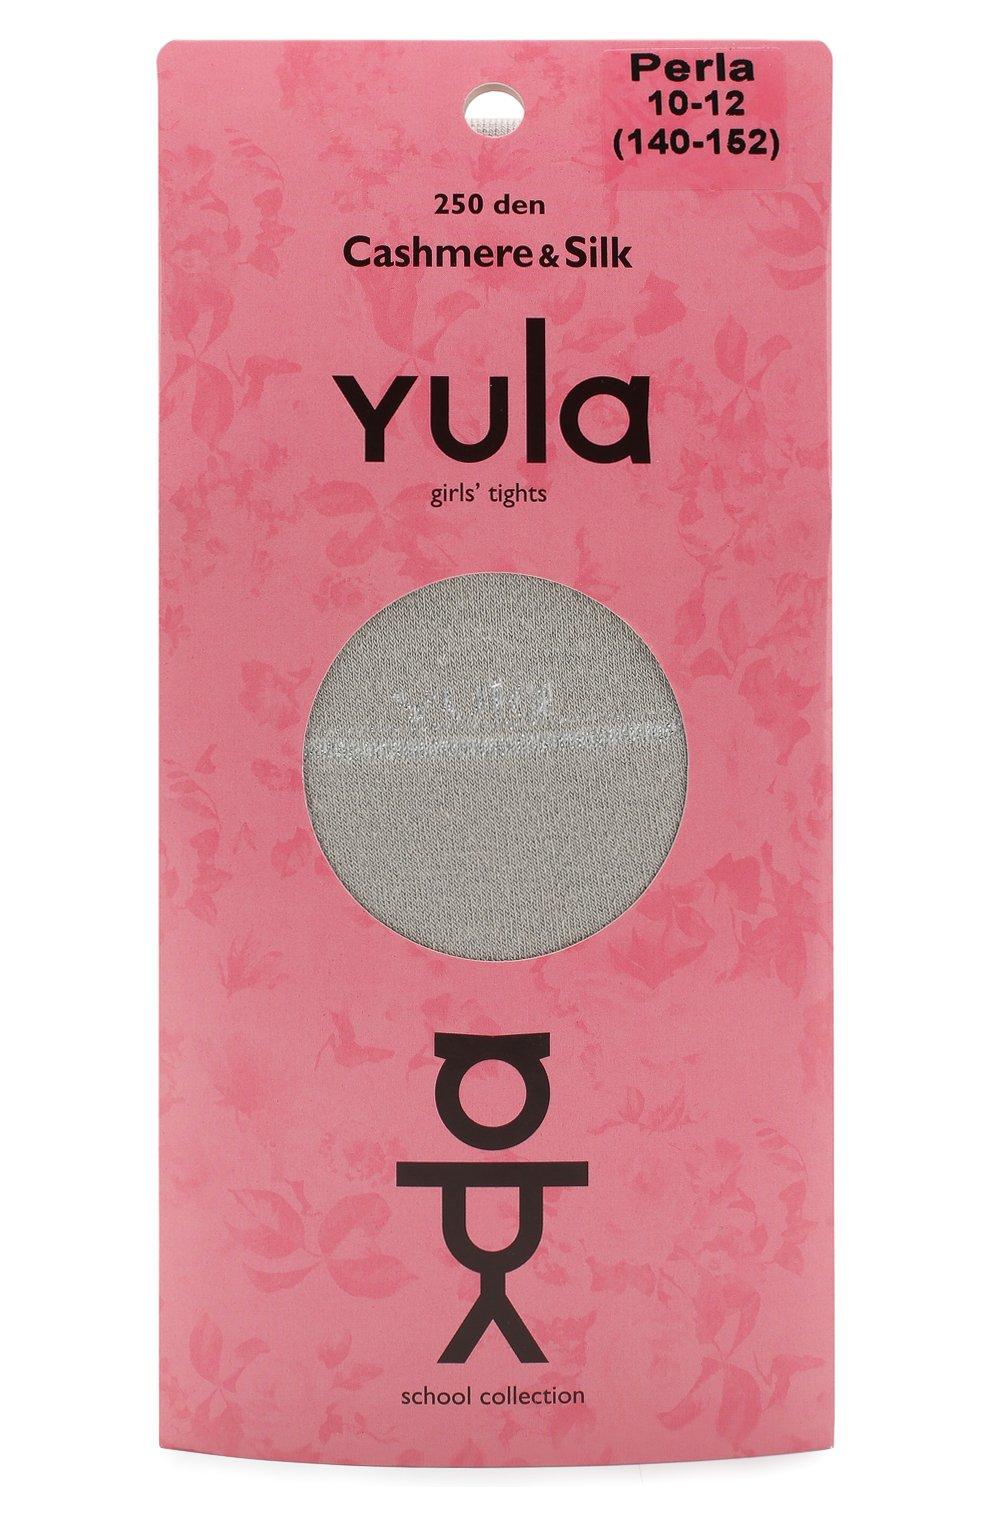 Детские колготки cashmere silk 250 den YULA бежевого цвета, арт. YU-206 | Фото 1